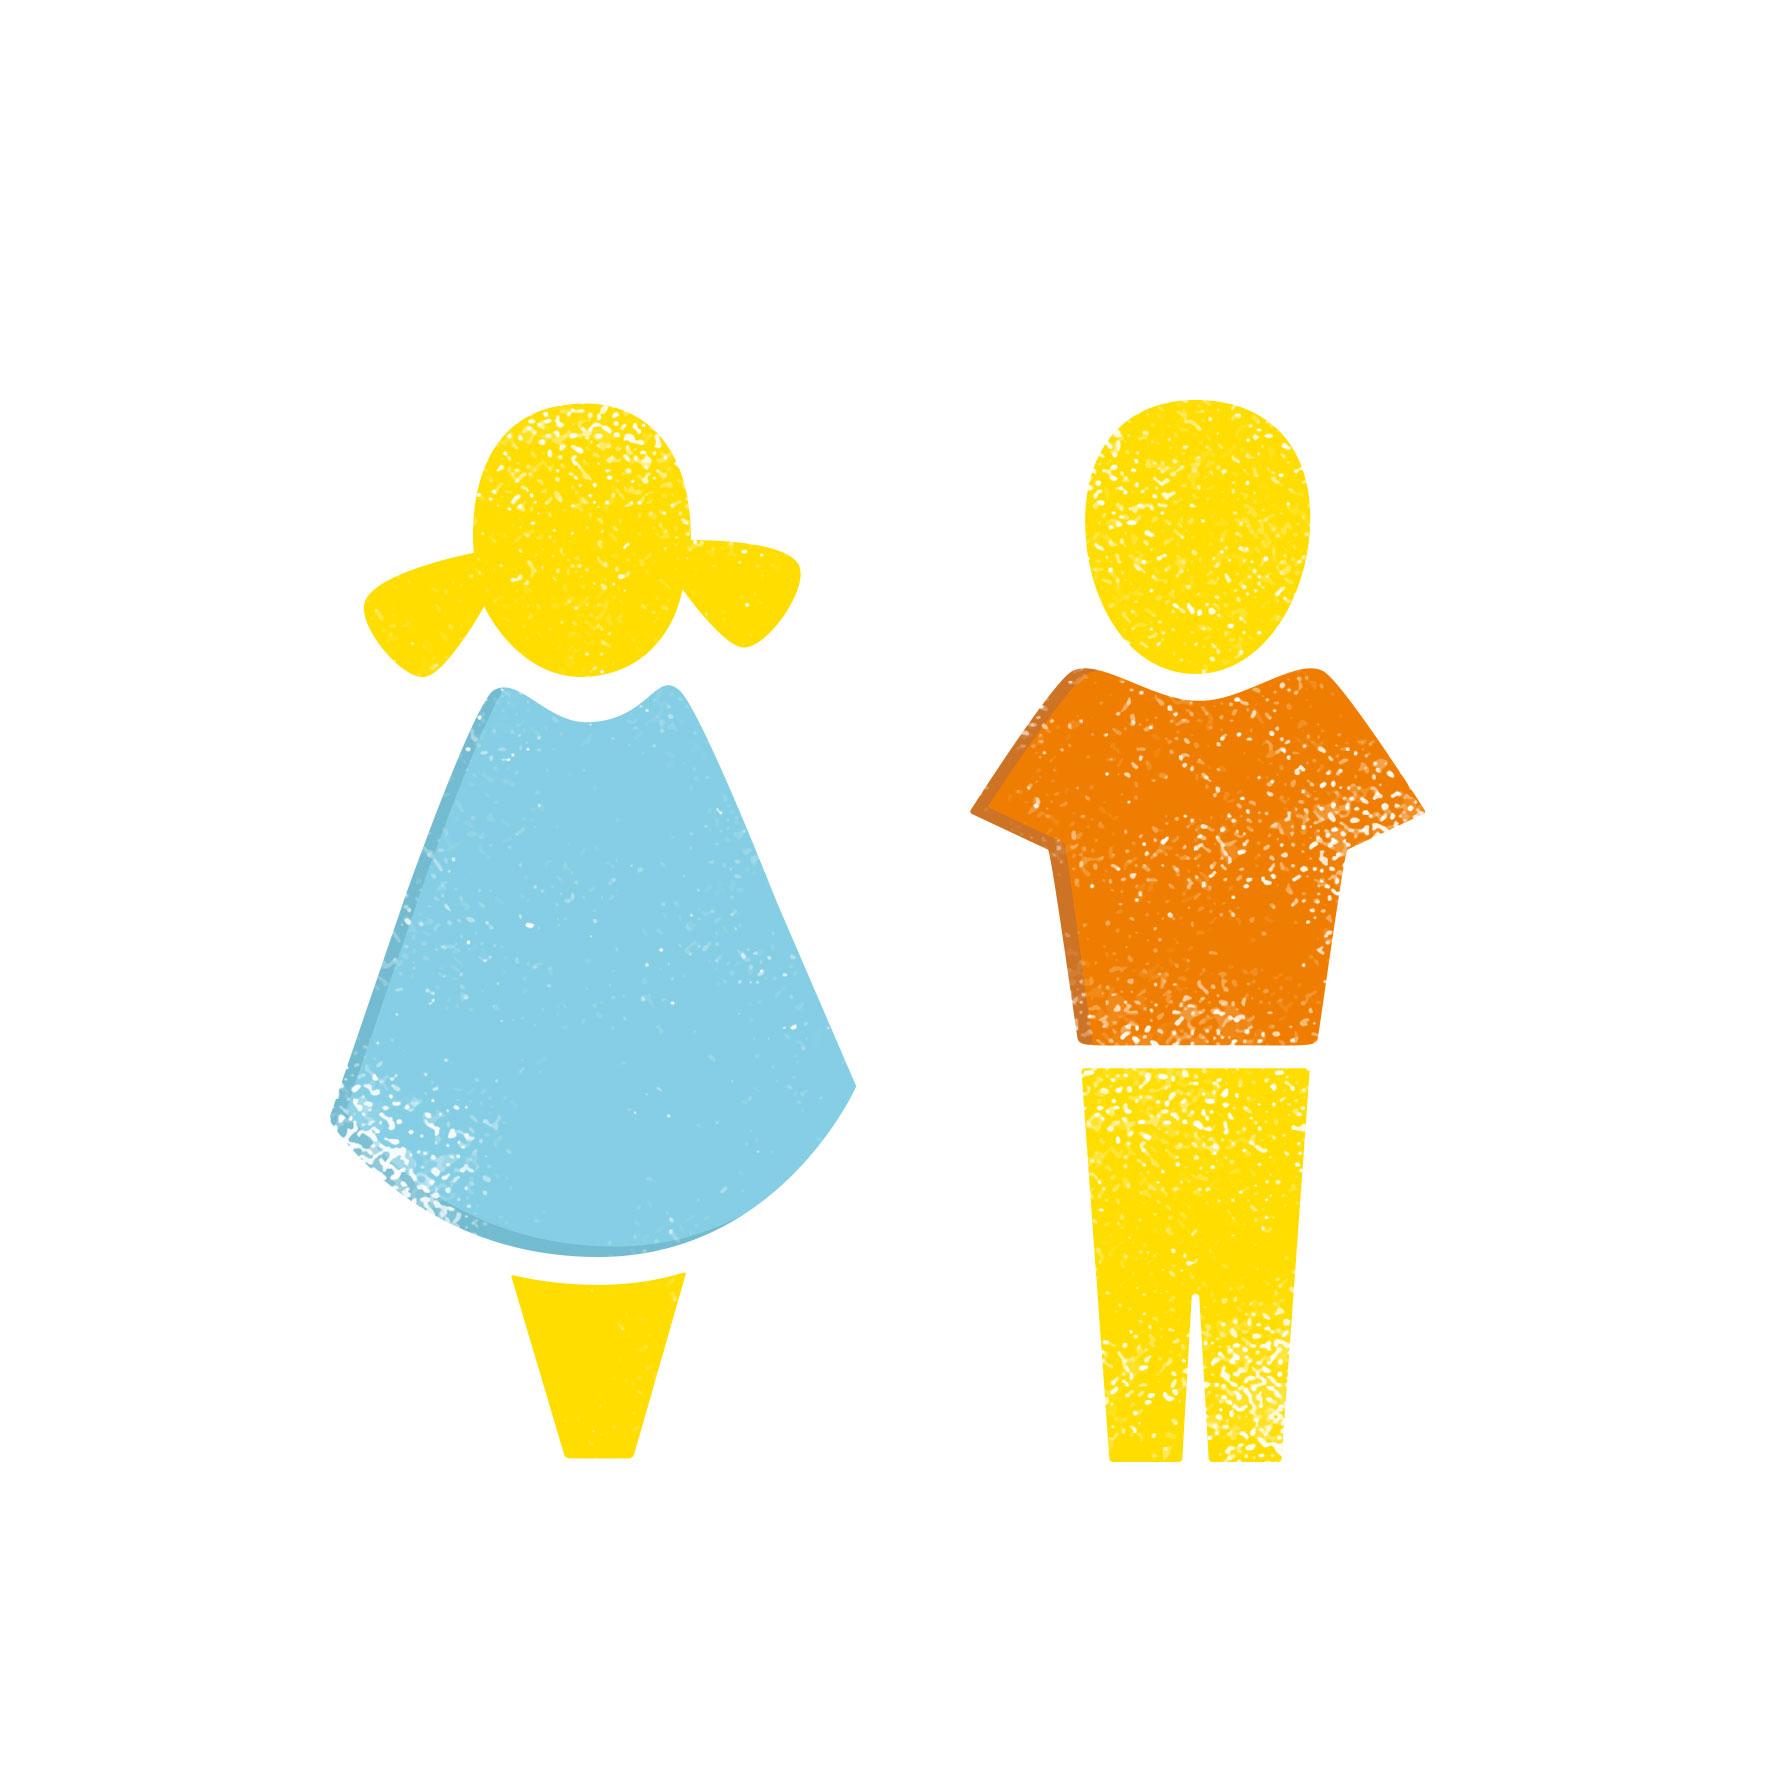 Boy-and-Girl-icon.jpg